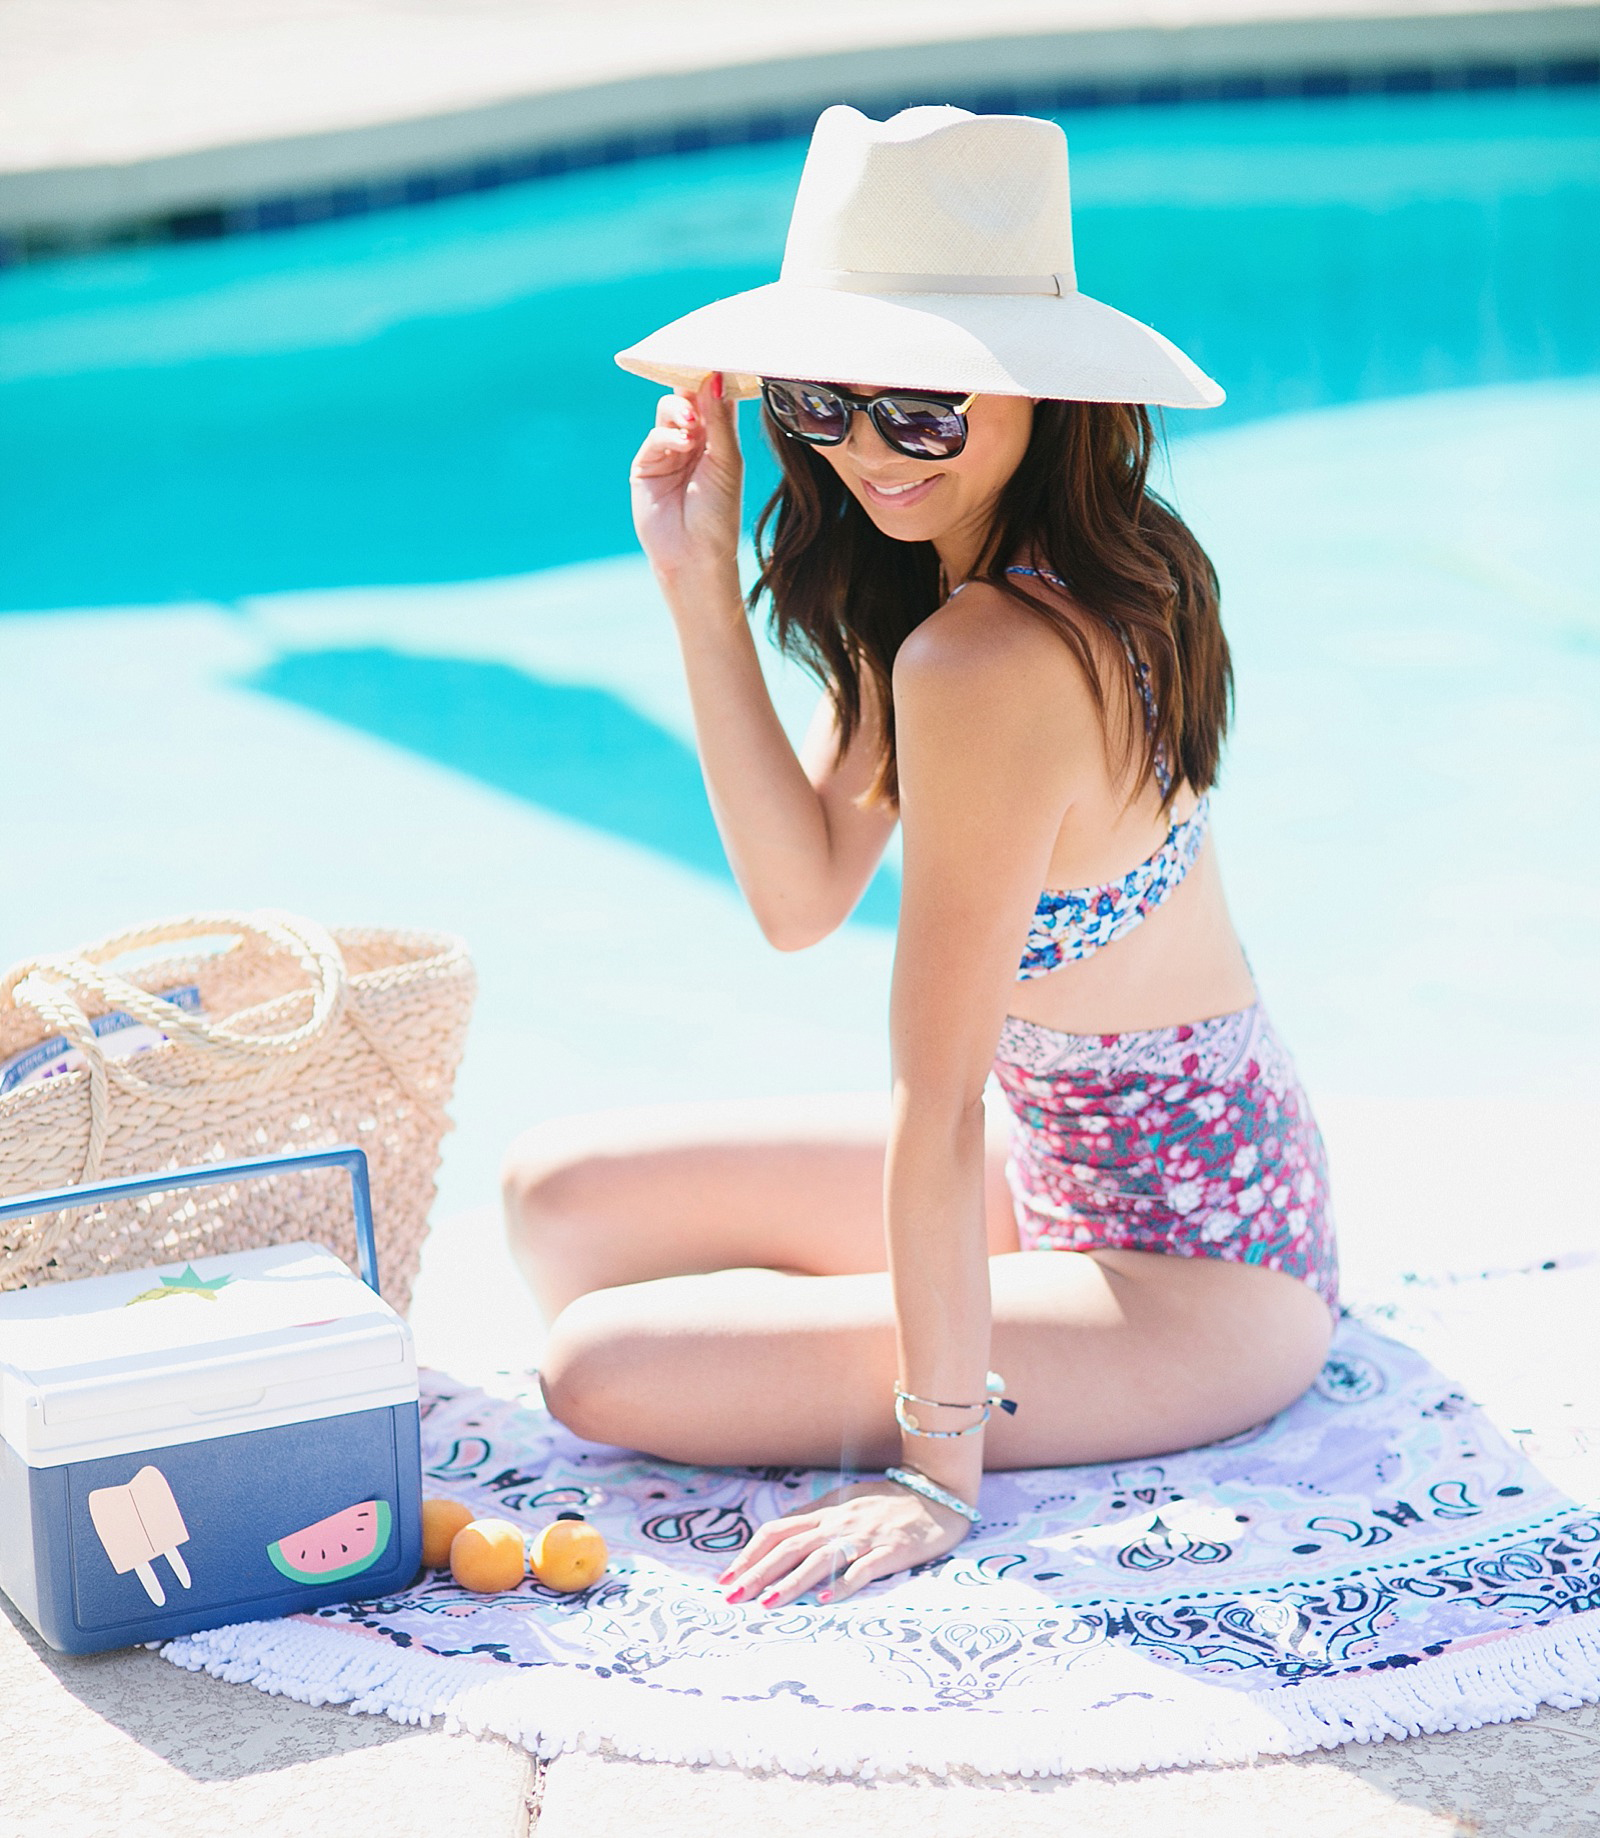 weight-watchers-pool-ready-summer-photoshoot-pool-shoot-model-lifestyle-blogger-arizona-phoenix-diana-elizabeth-blog-_00431